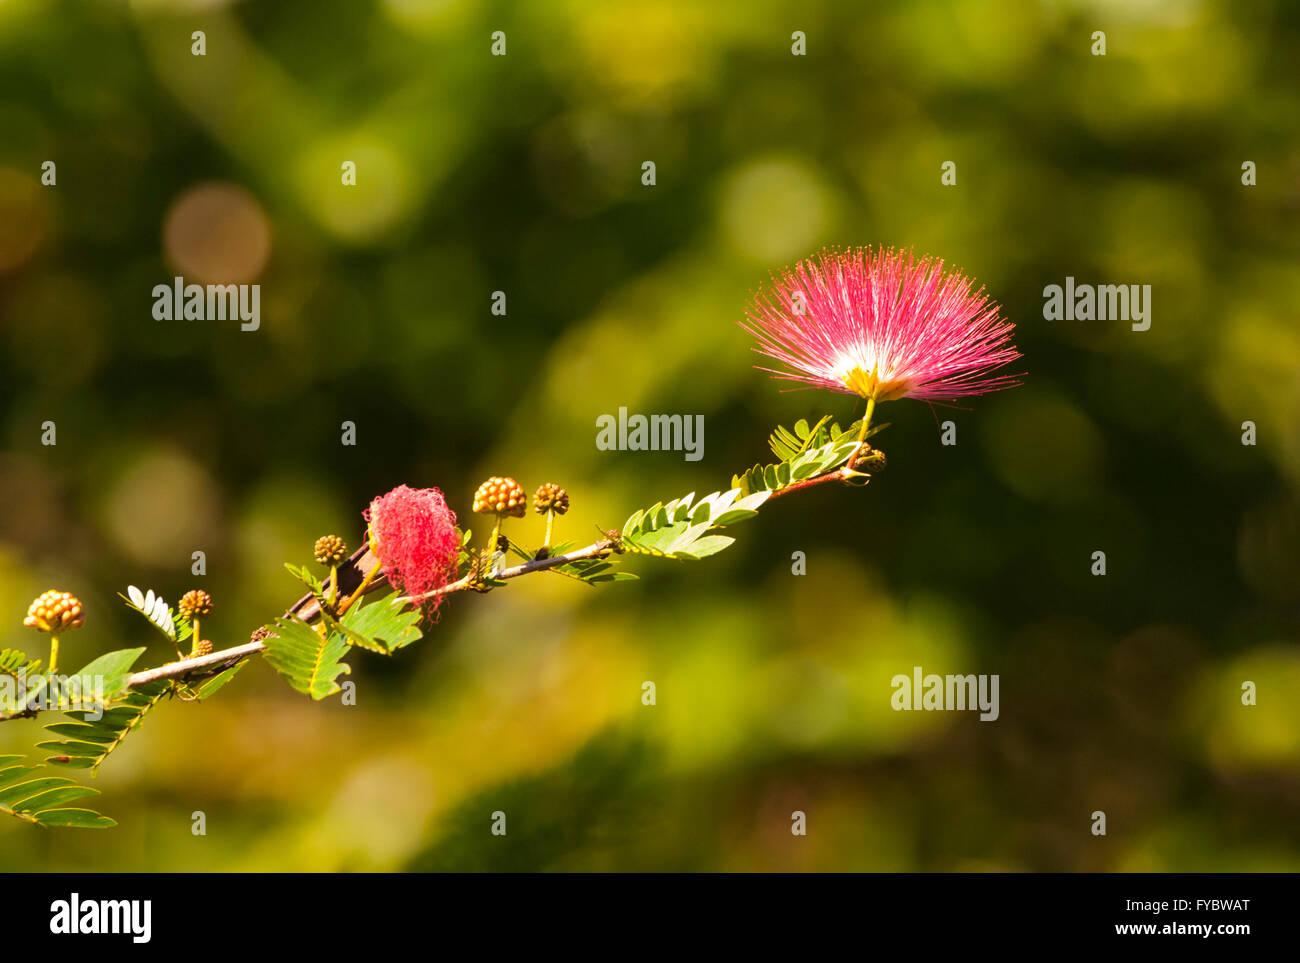 Myrtaceae flower, Far North Queensland, FNQ, QLD, Australia - Stock Image